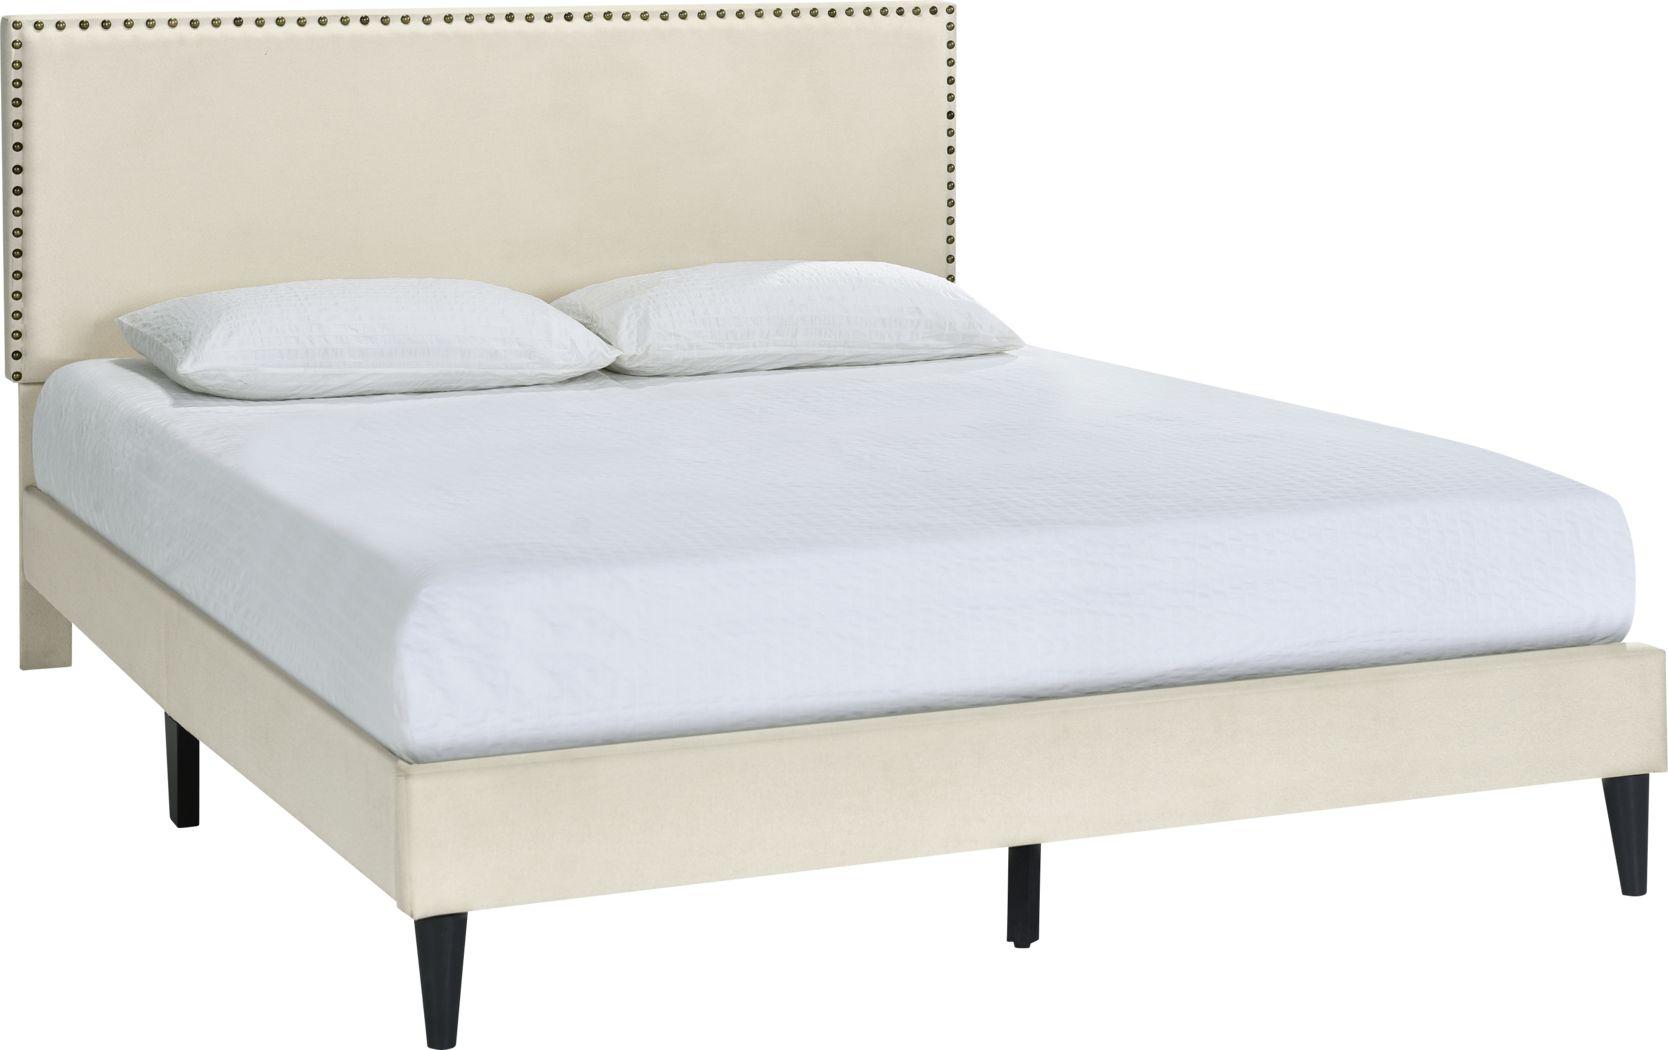 Lunsford Beige Queen Bed